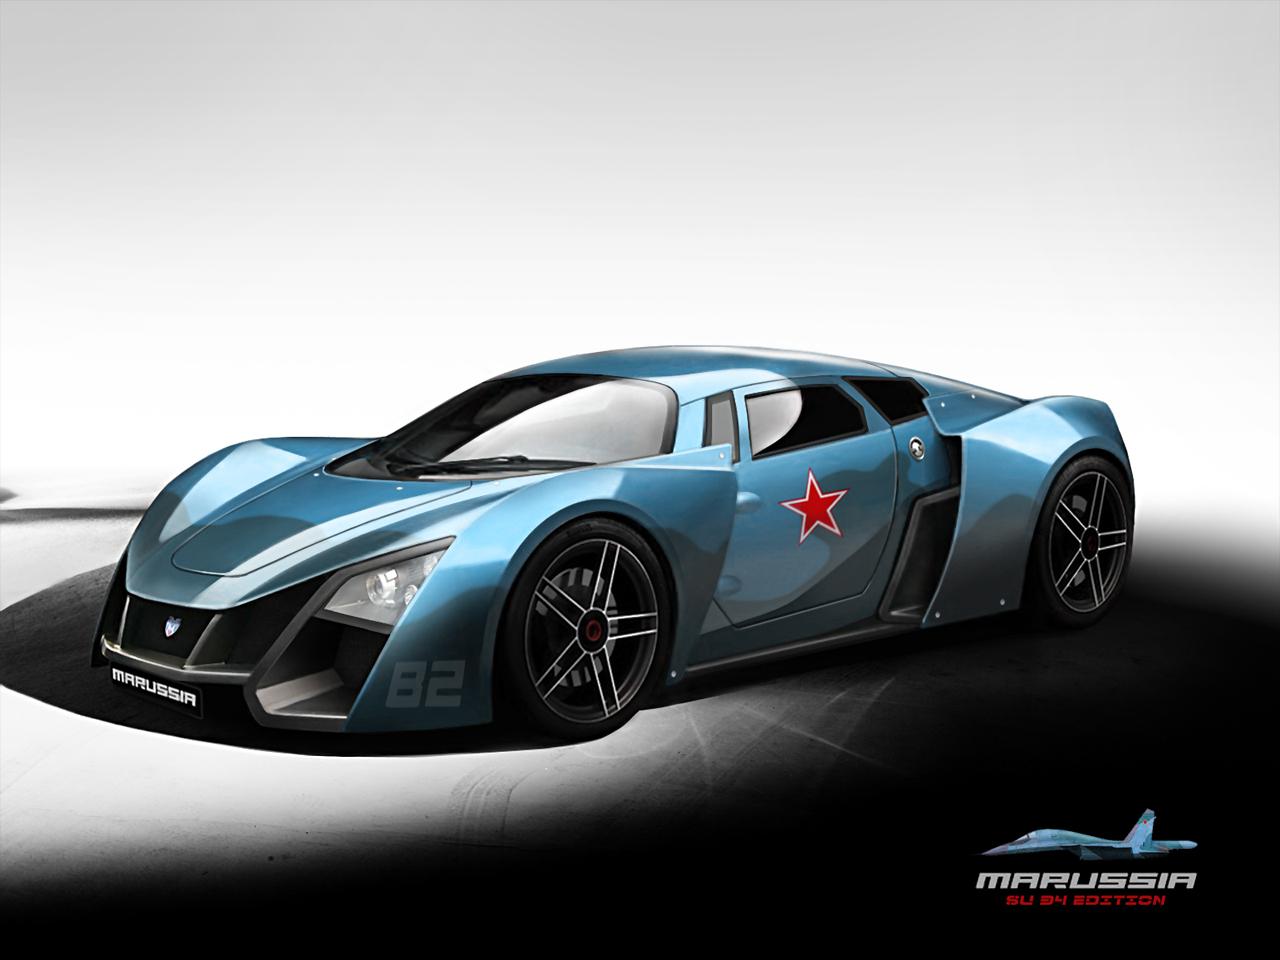 cars master zone: Favorite car: Marussia B2